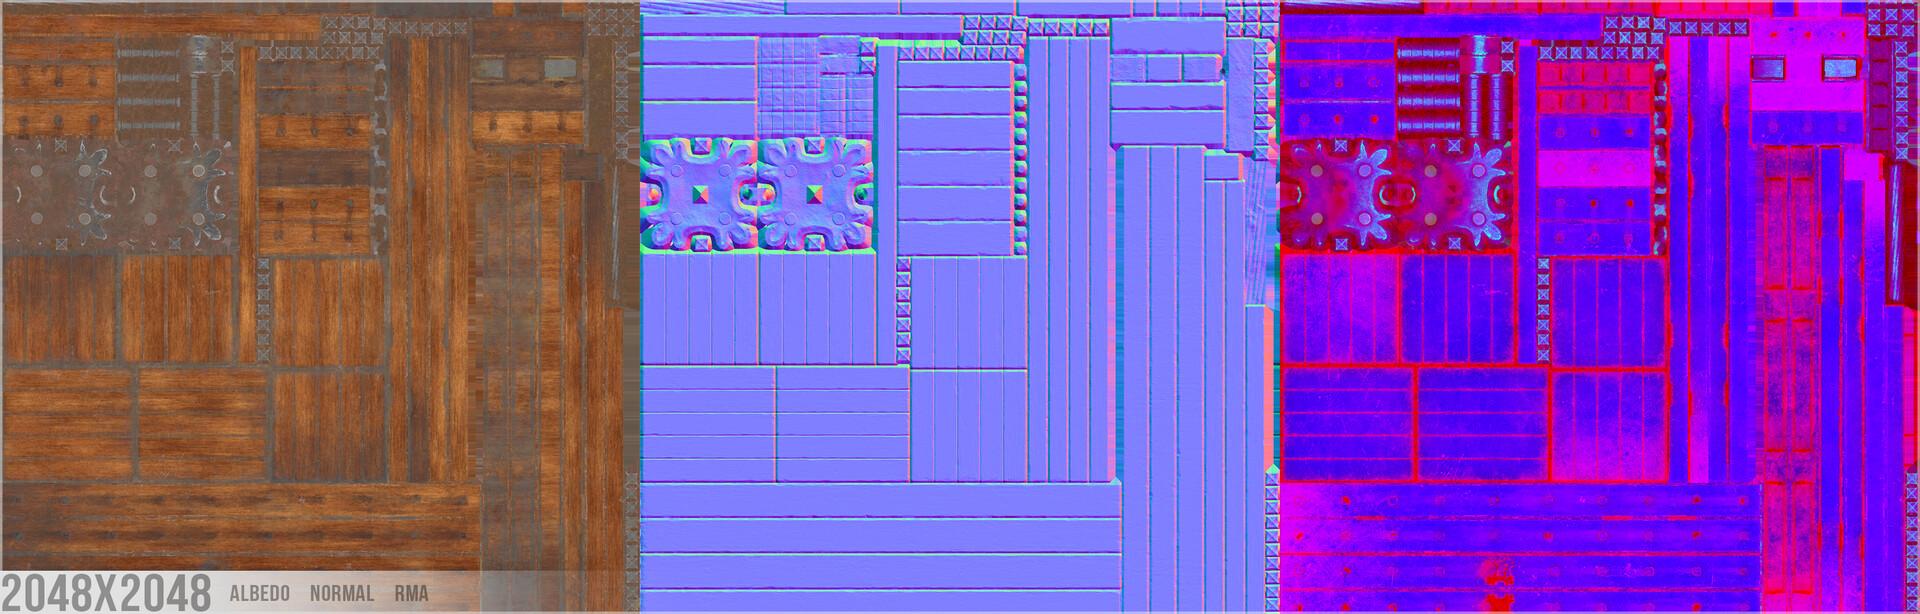 Breakdown (RMA = Roughness, Metallic, AO)